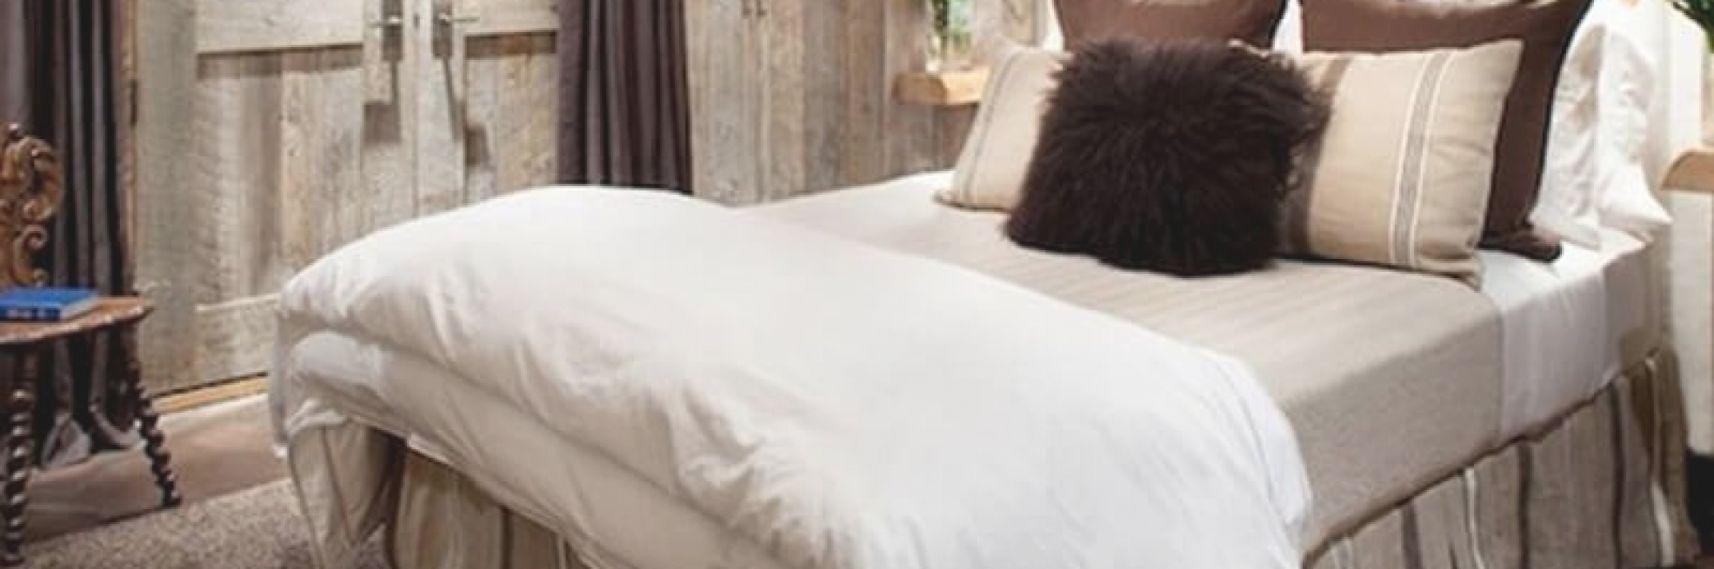 Rustic Bedroom Decoration Ideas Best Decor Designs for Rustic Bedroom Decorating Ideas